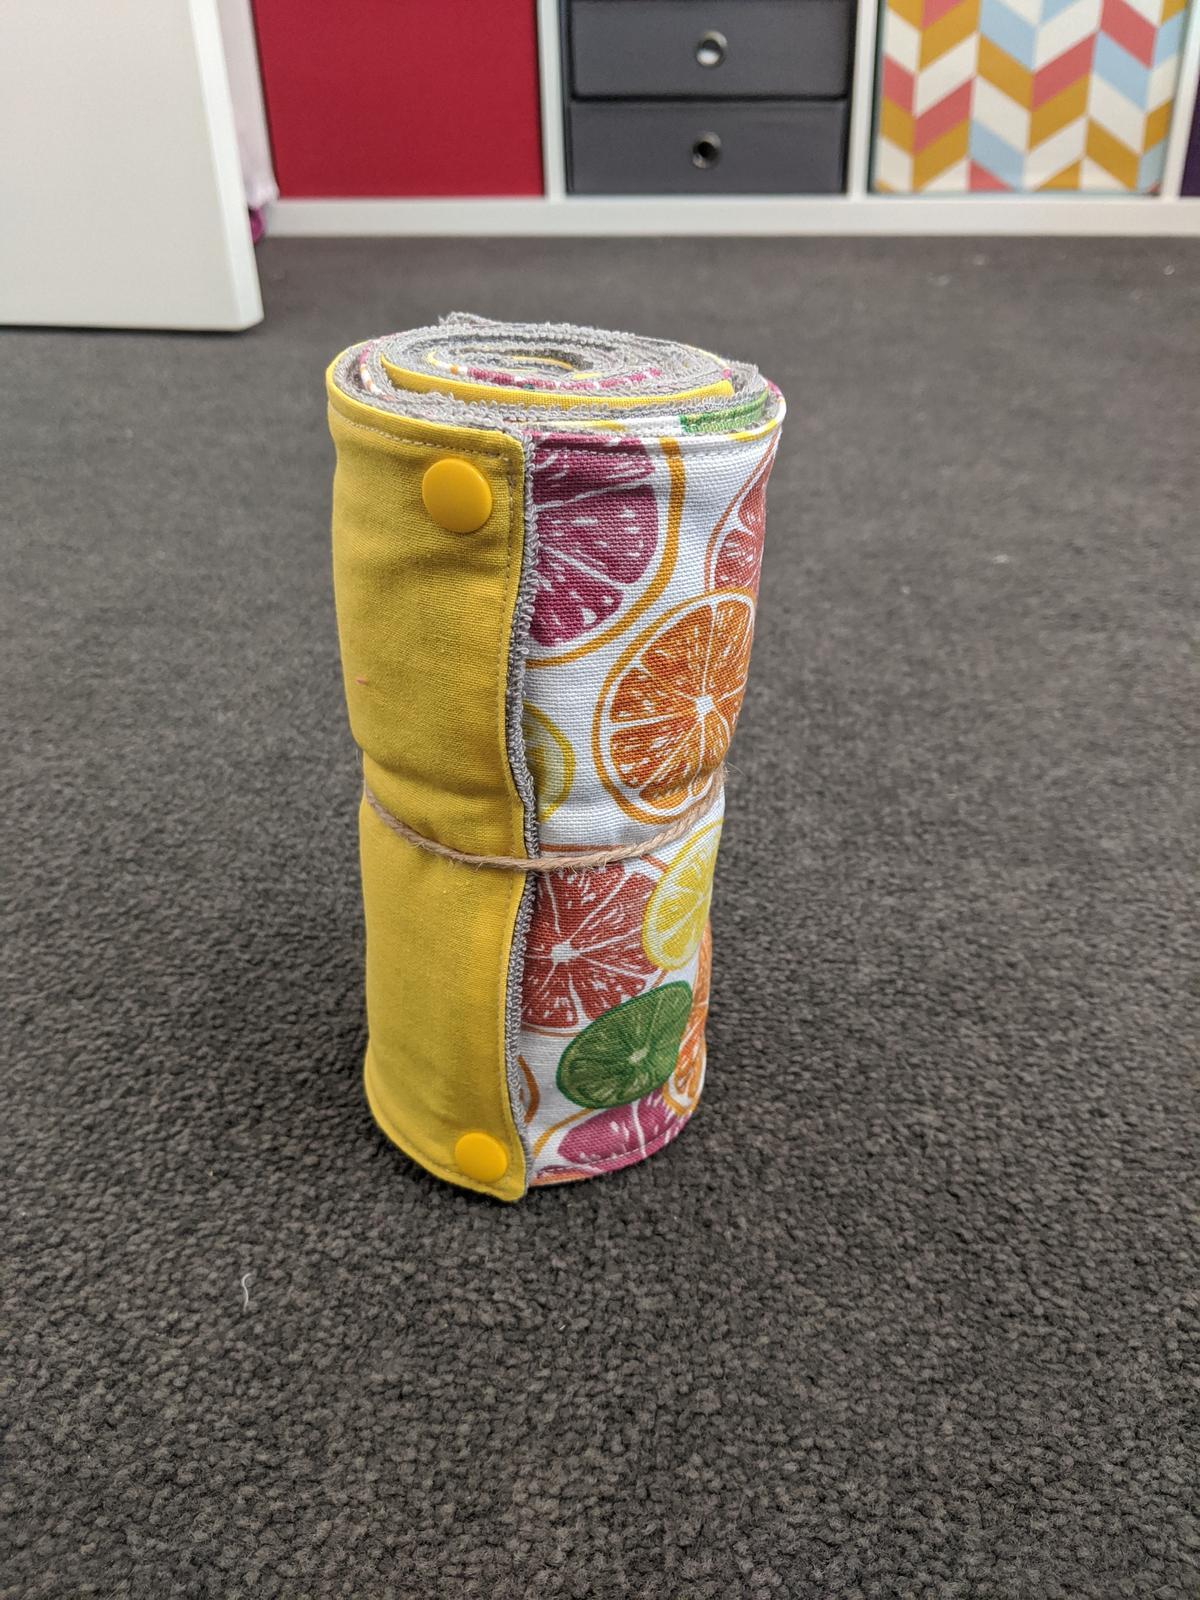 Citrus Reusable Paper towels